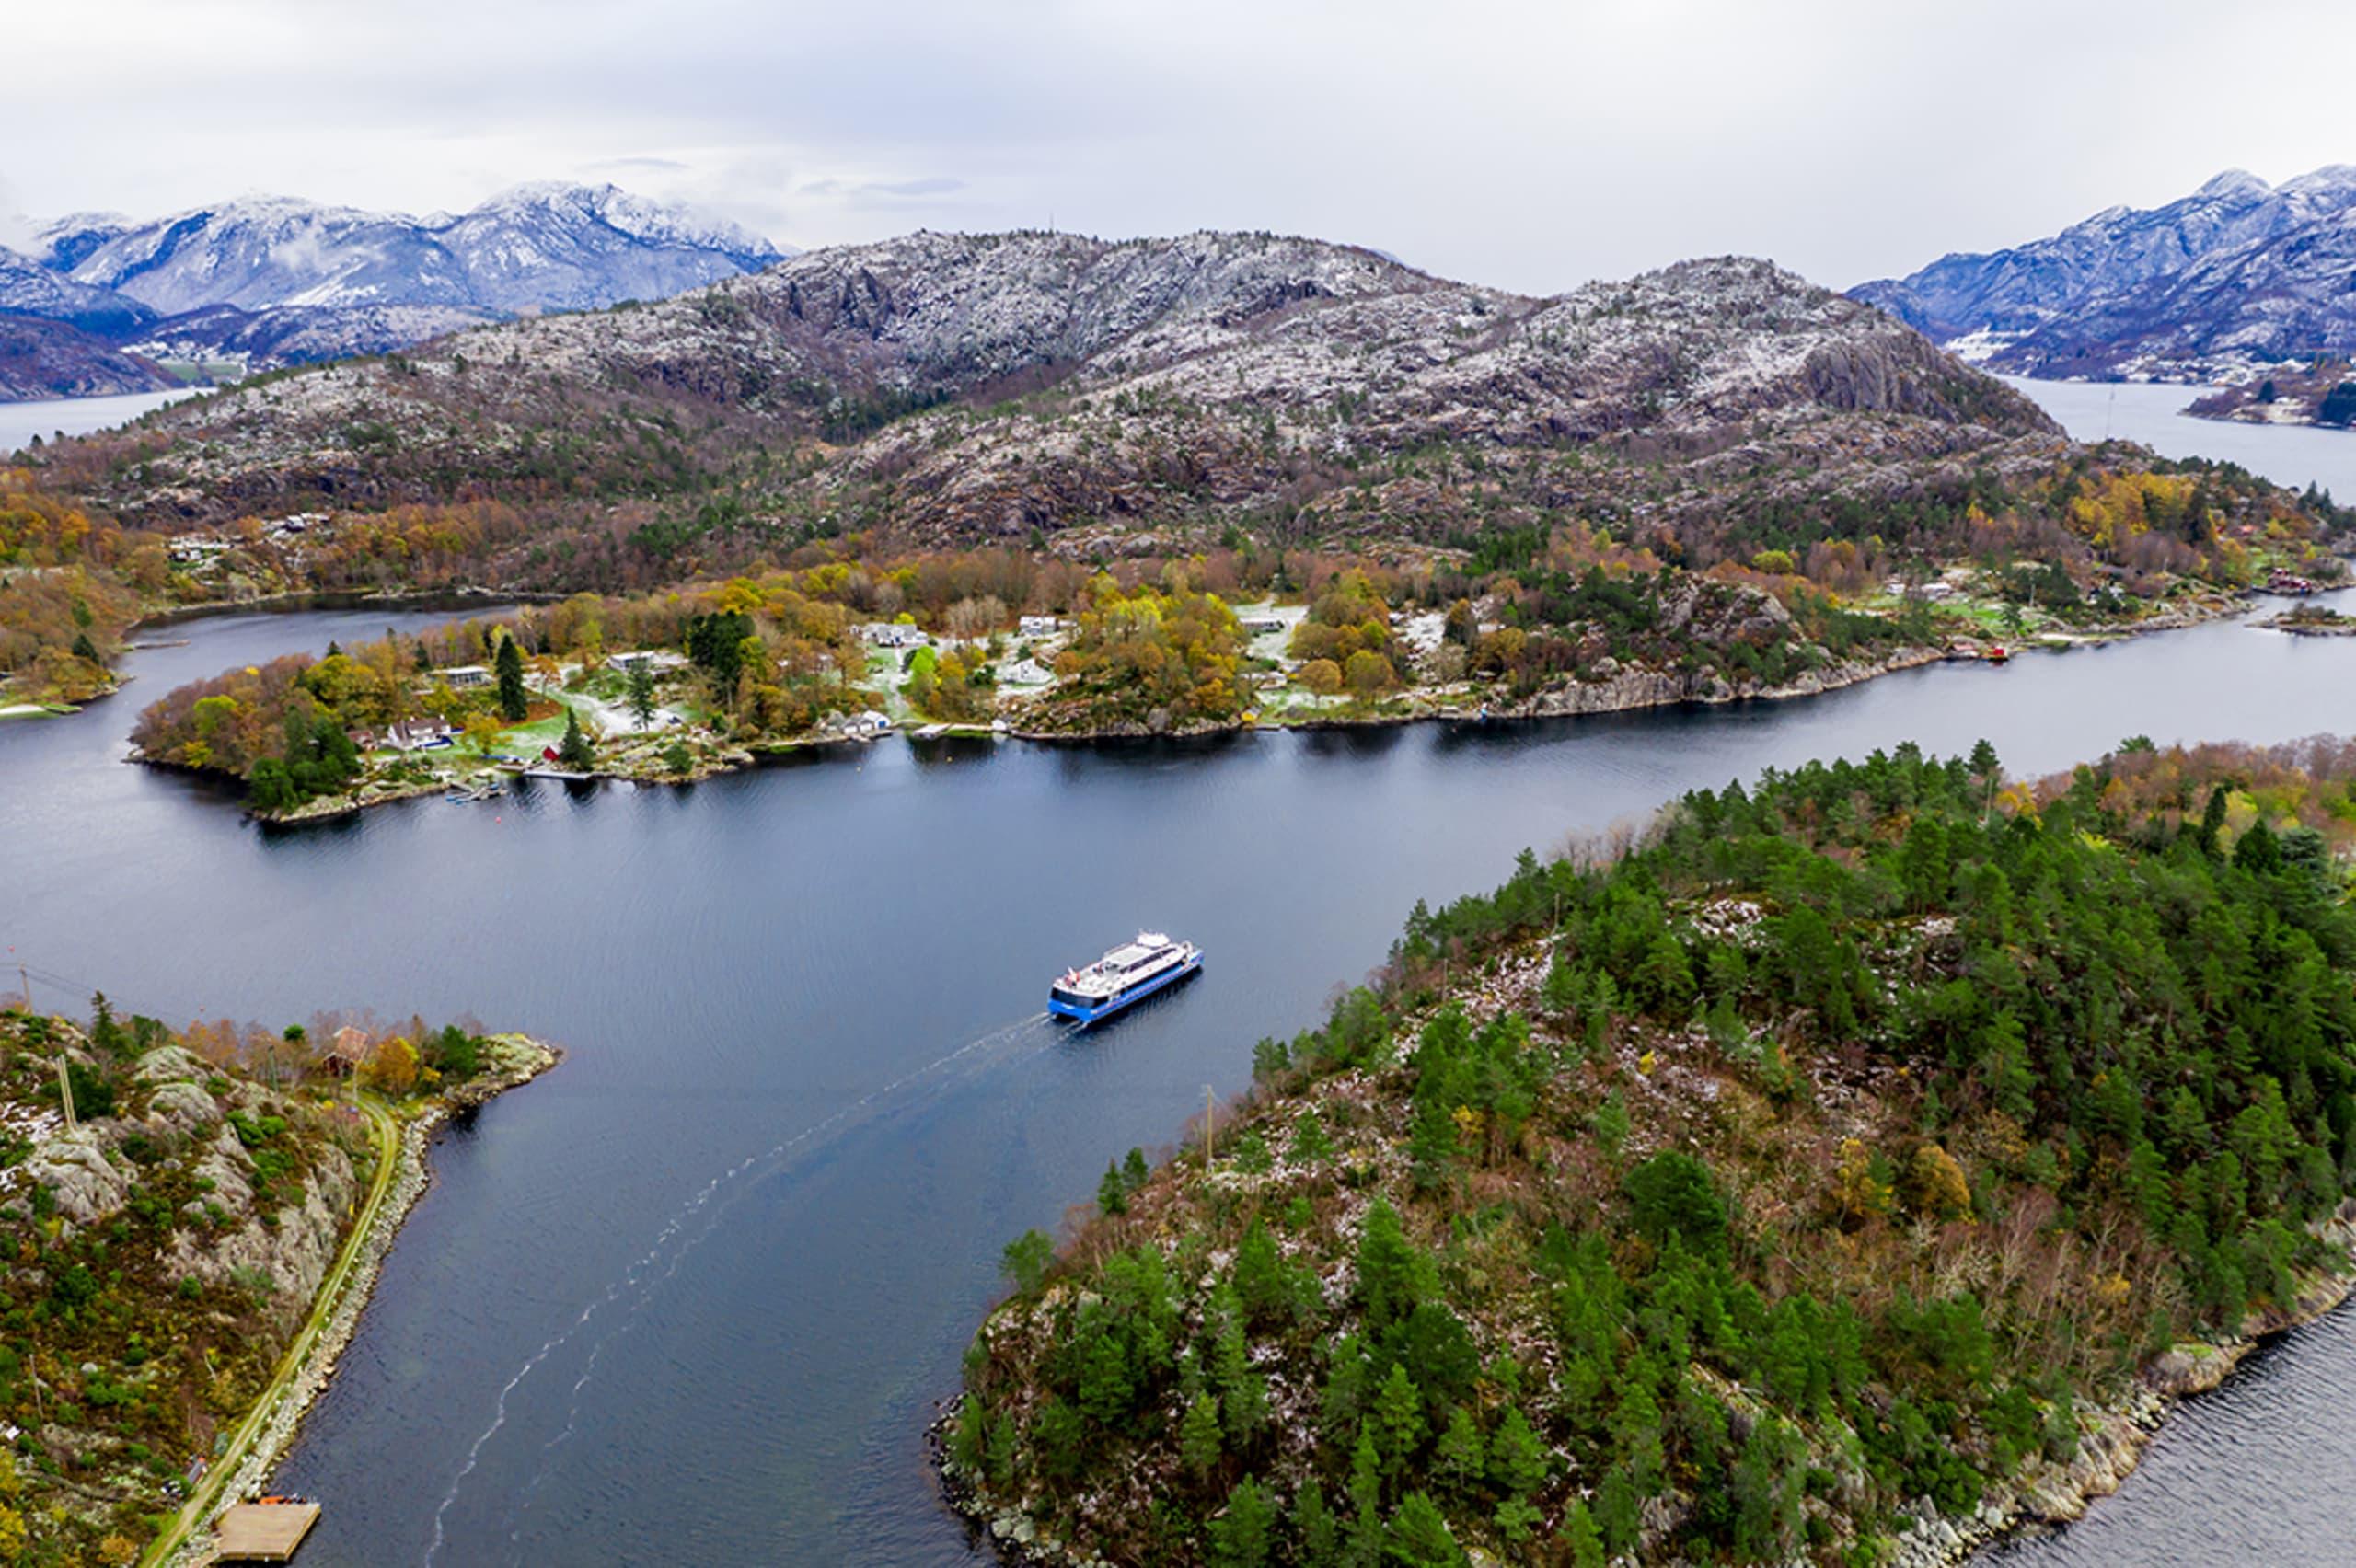 Rygerelektra sailing on the Lysefjord